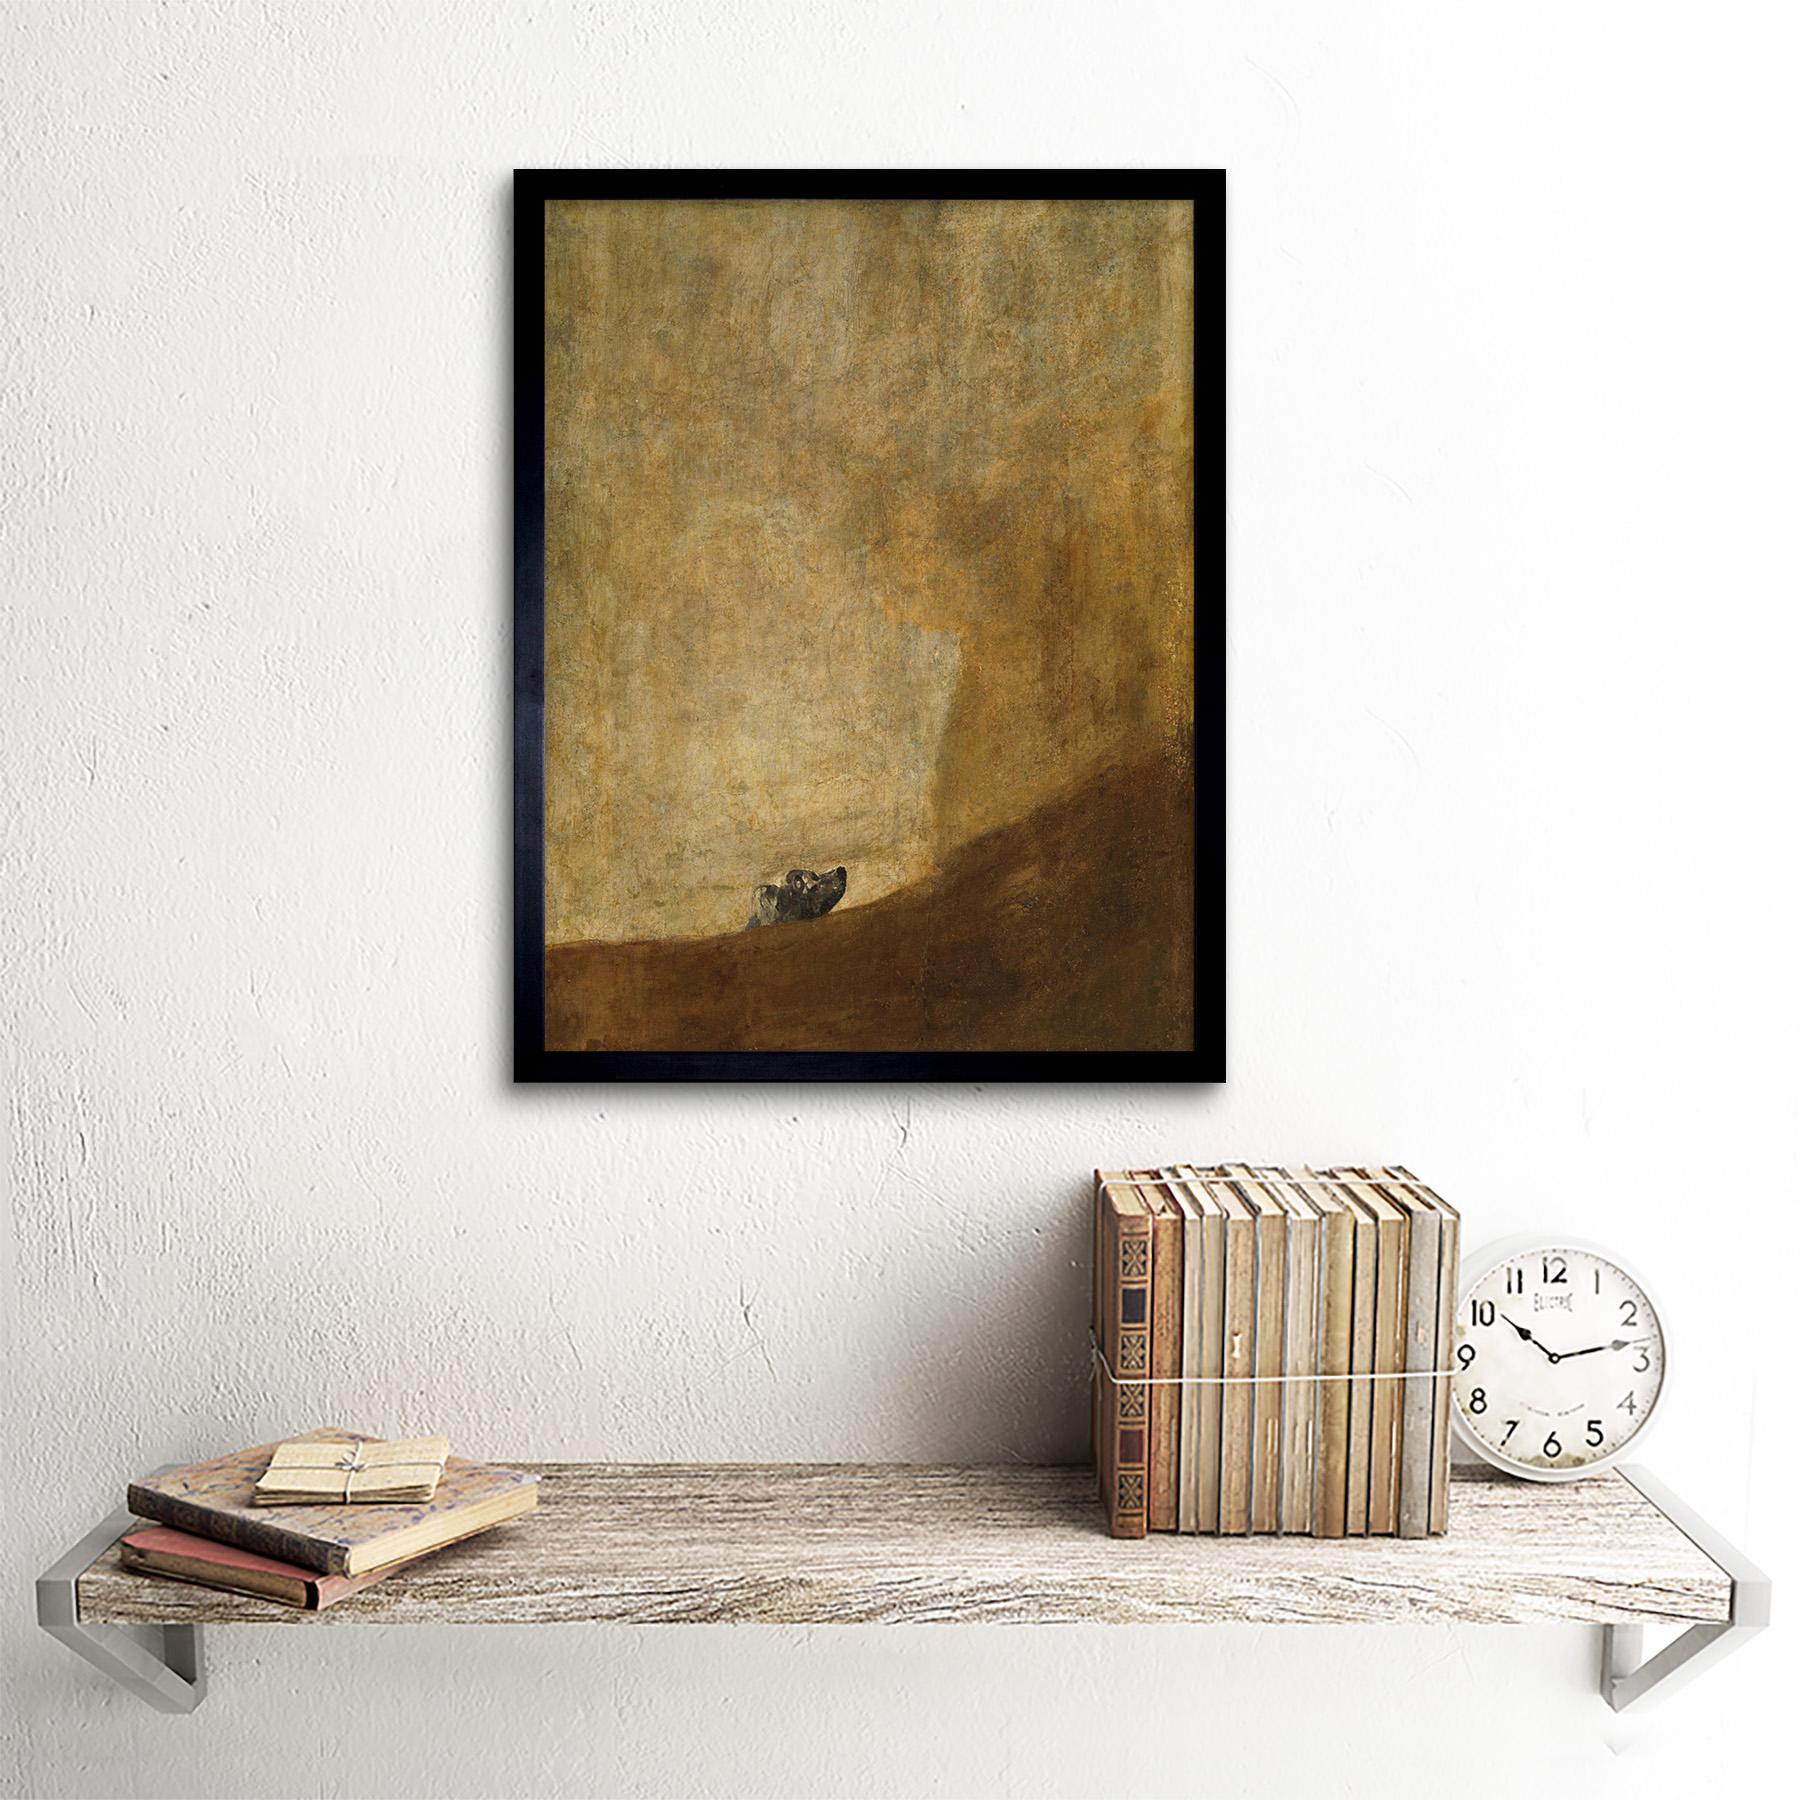 Goya-Dog-Painting-Wall-Art-Print-Framed-12x16 thumbnail 3